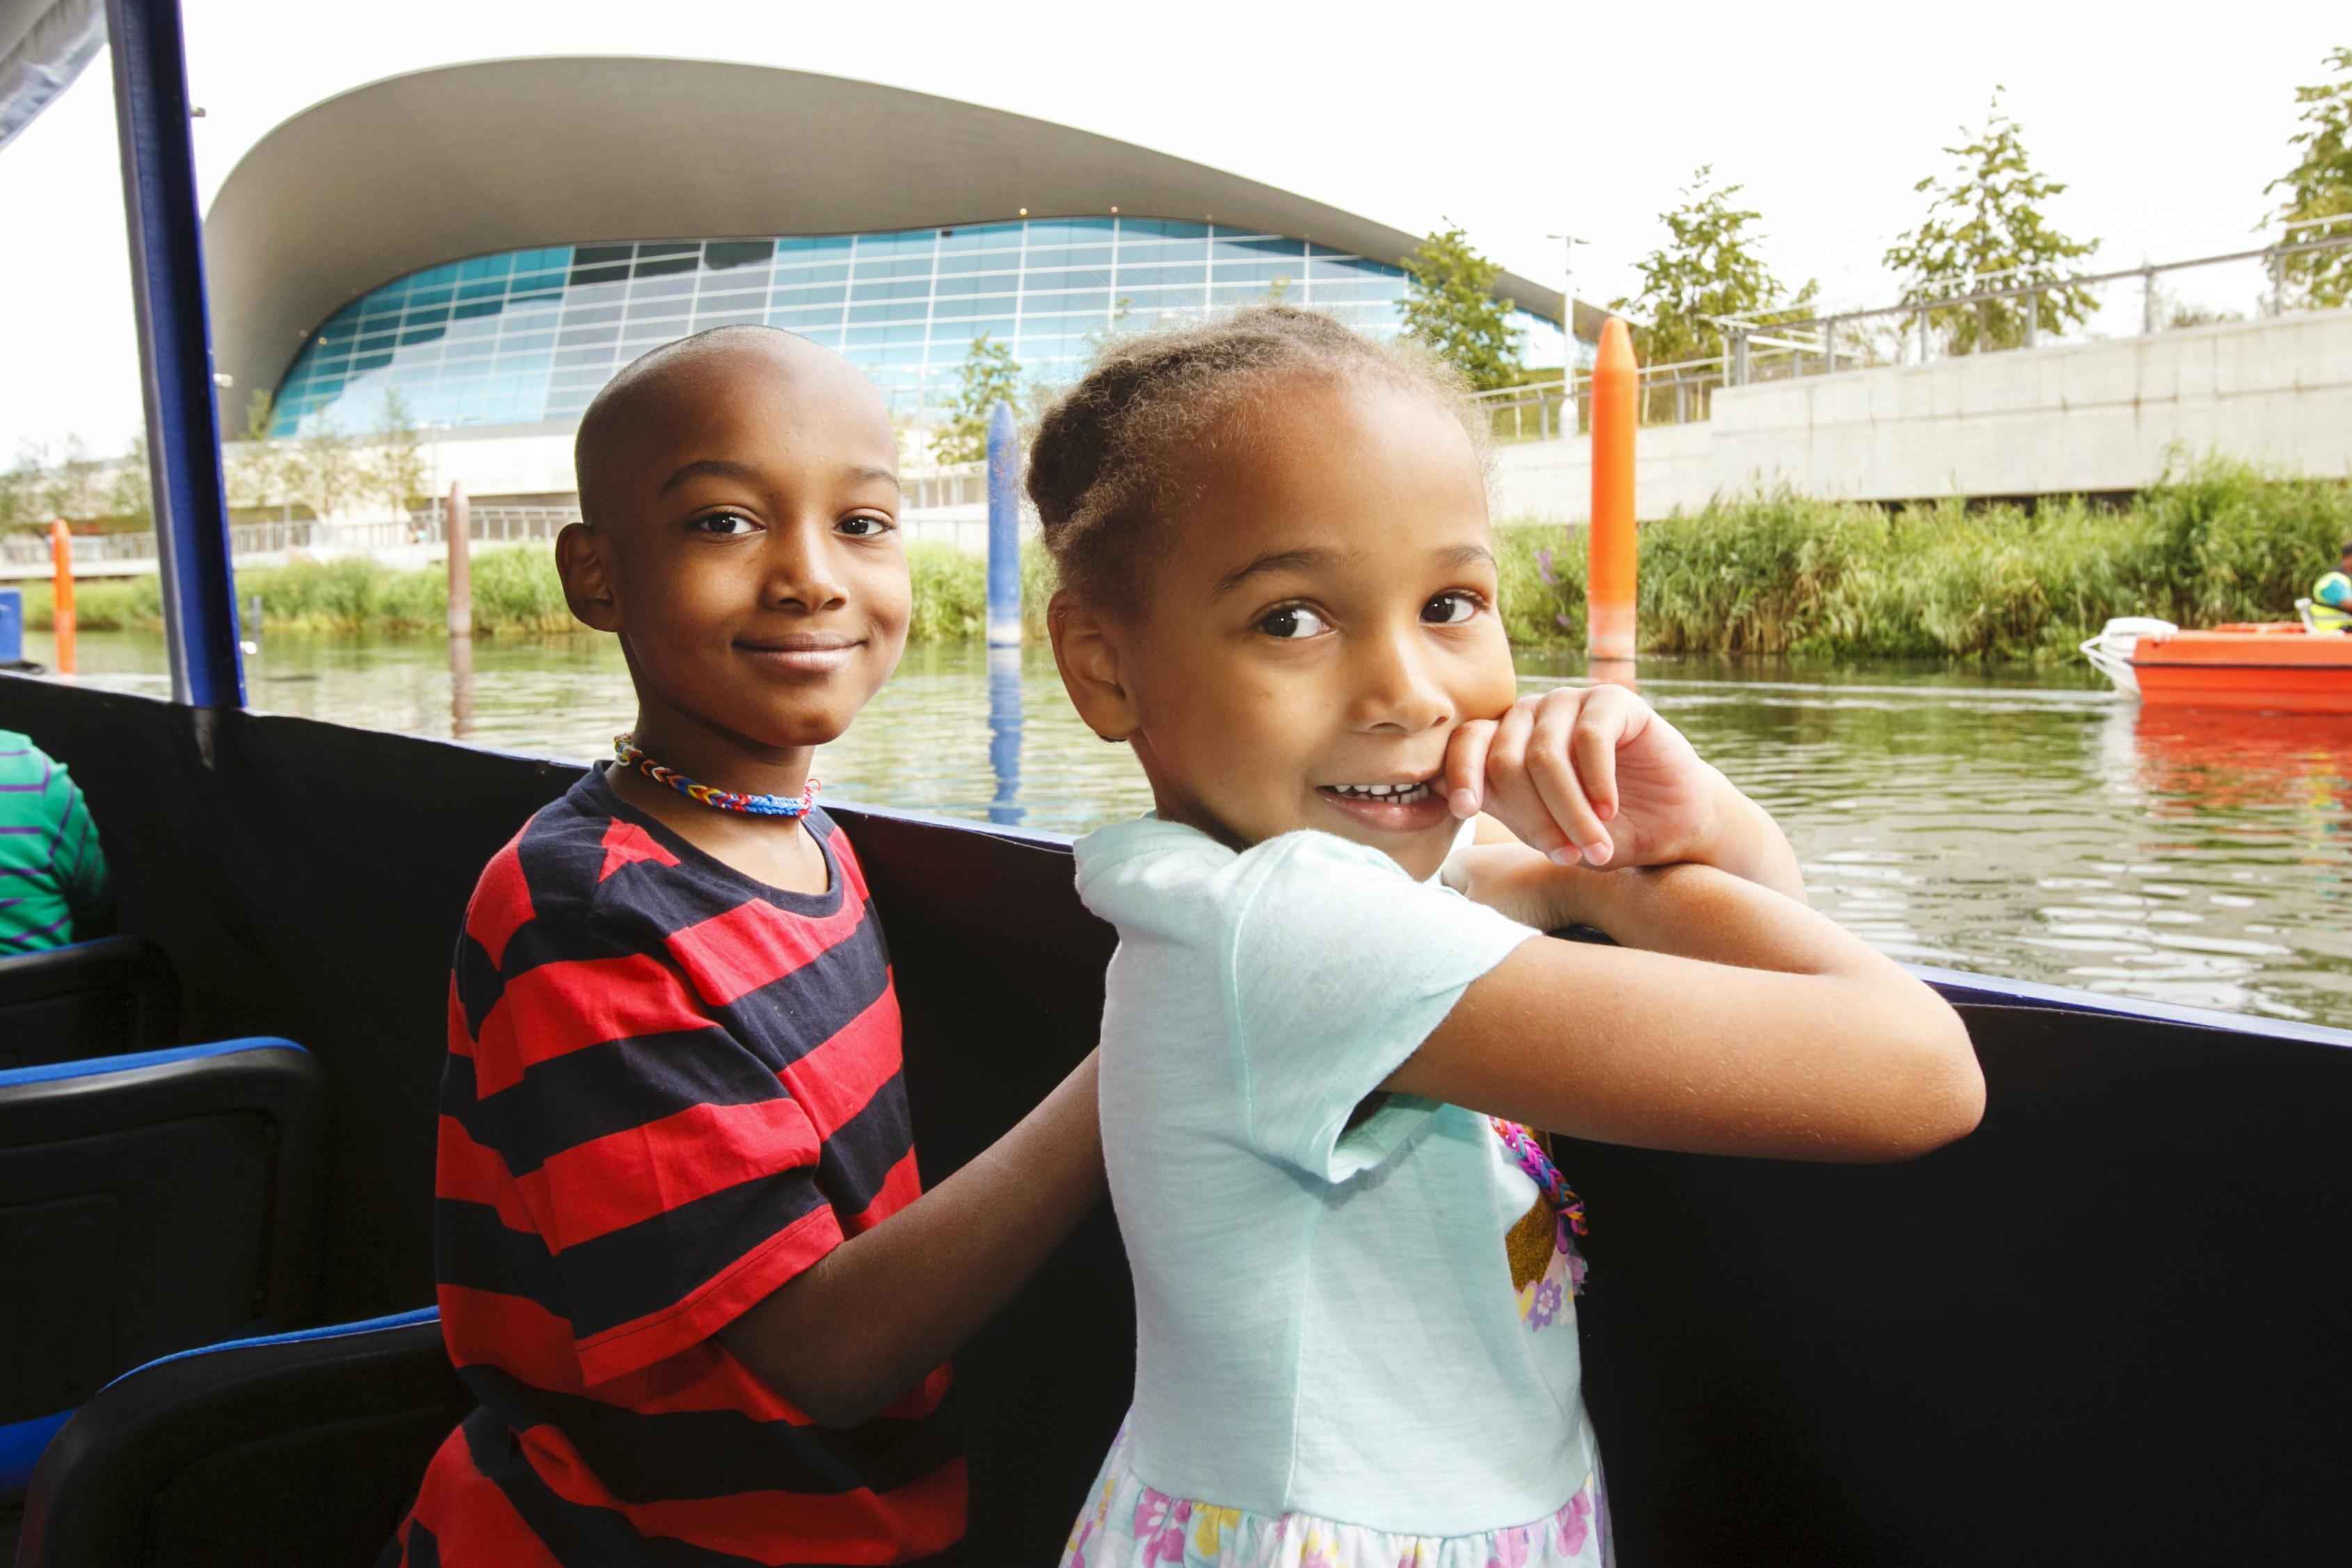 East London Waterways Festival - Queen Elizabeth Olympic Park